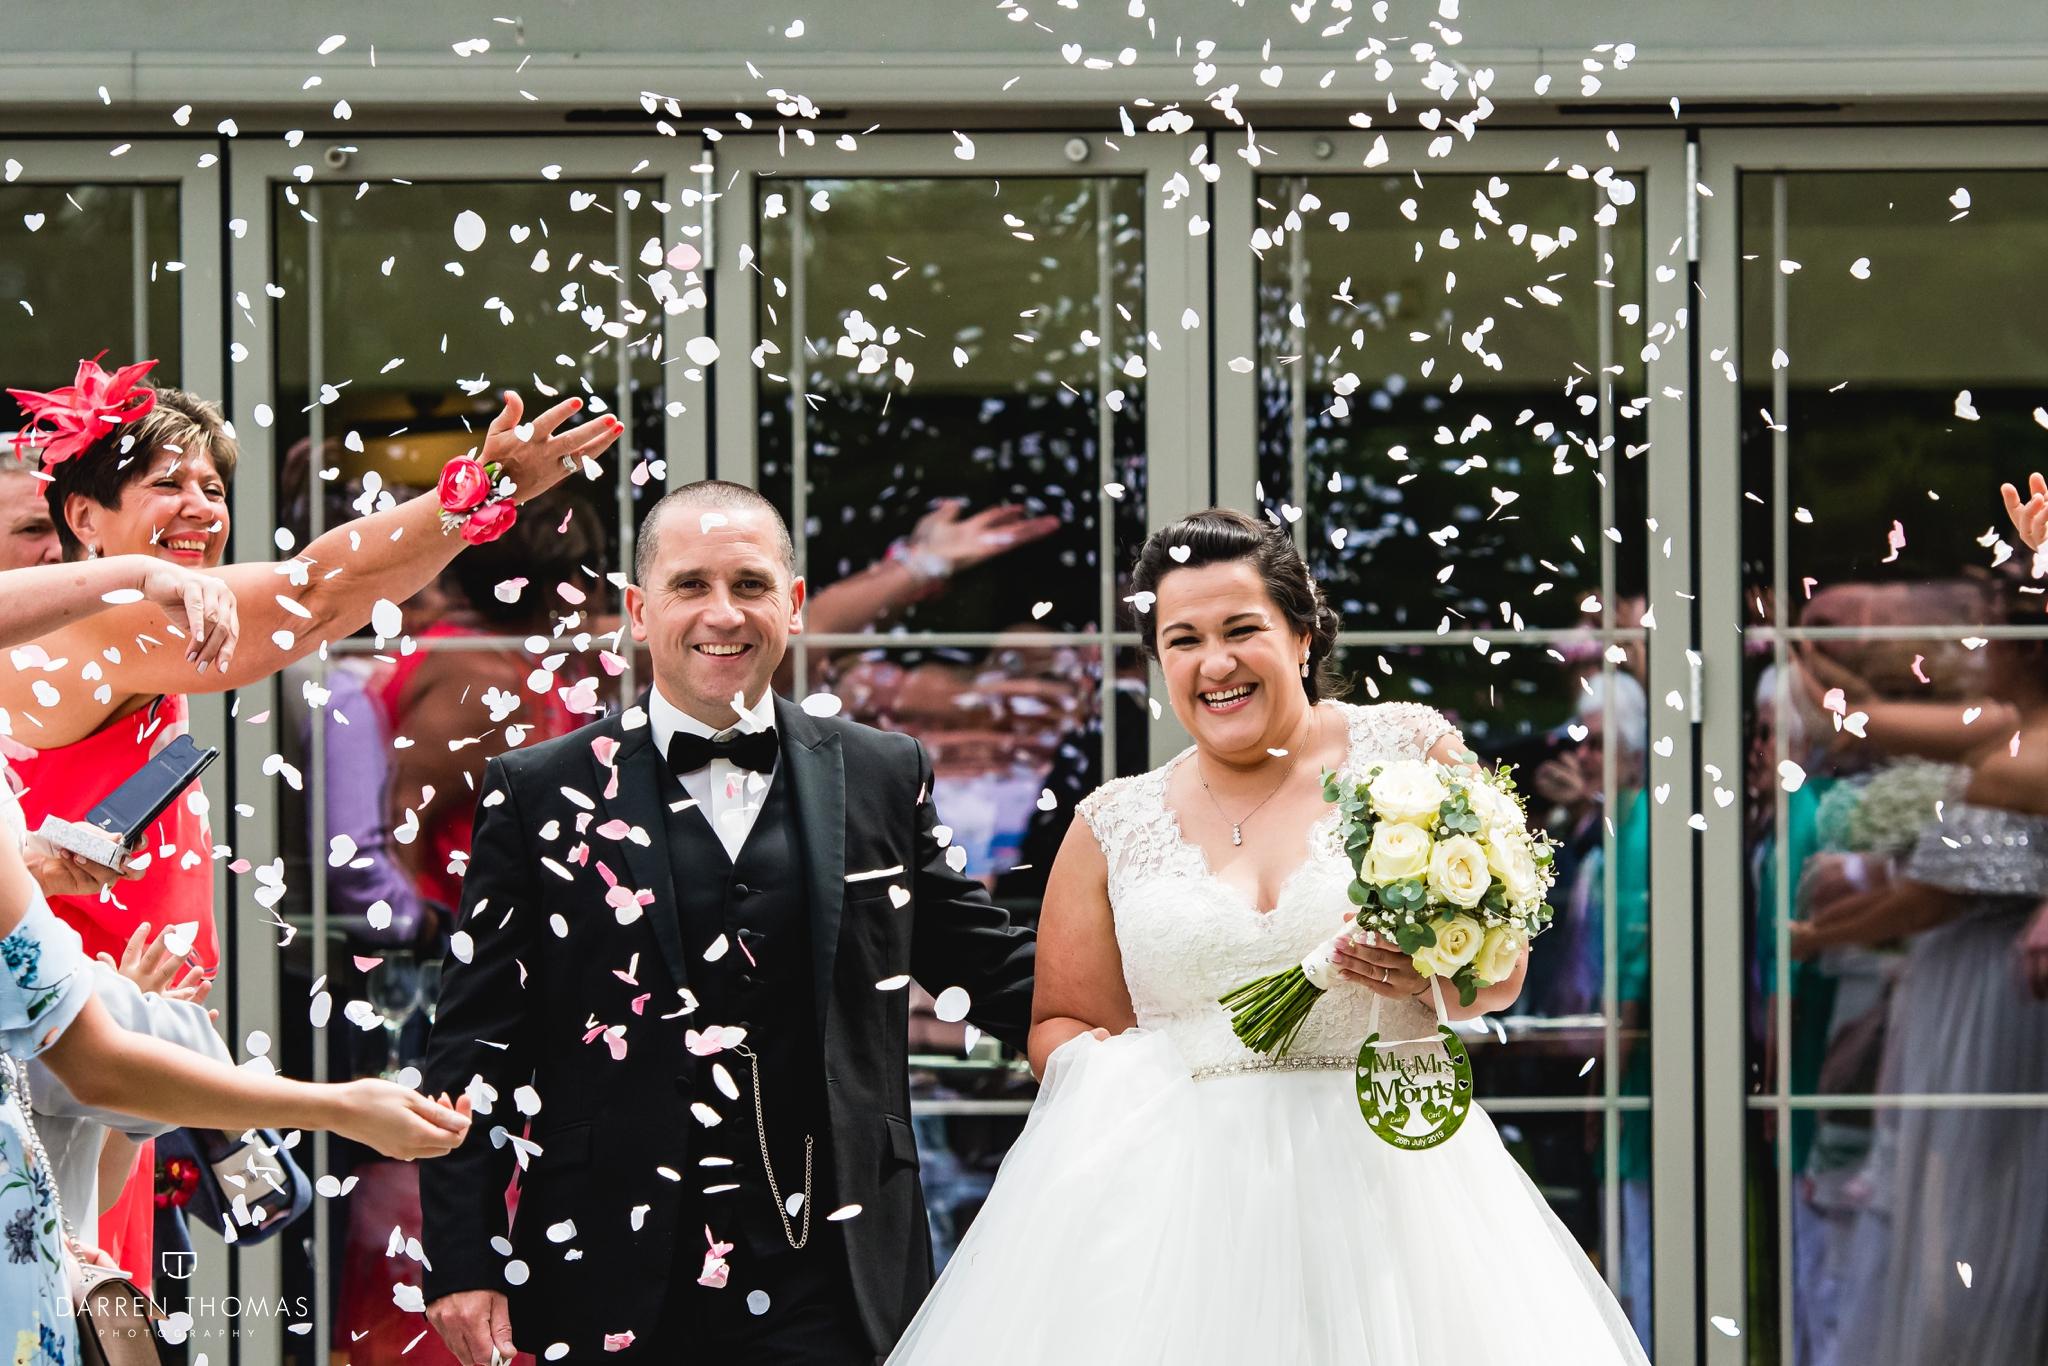 Llechwen-hall-wedding-photography11.jpg